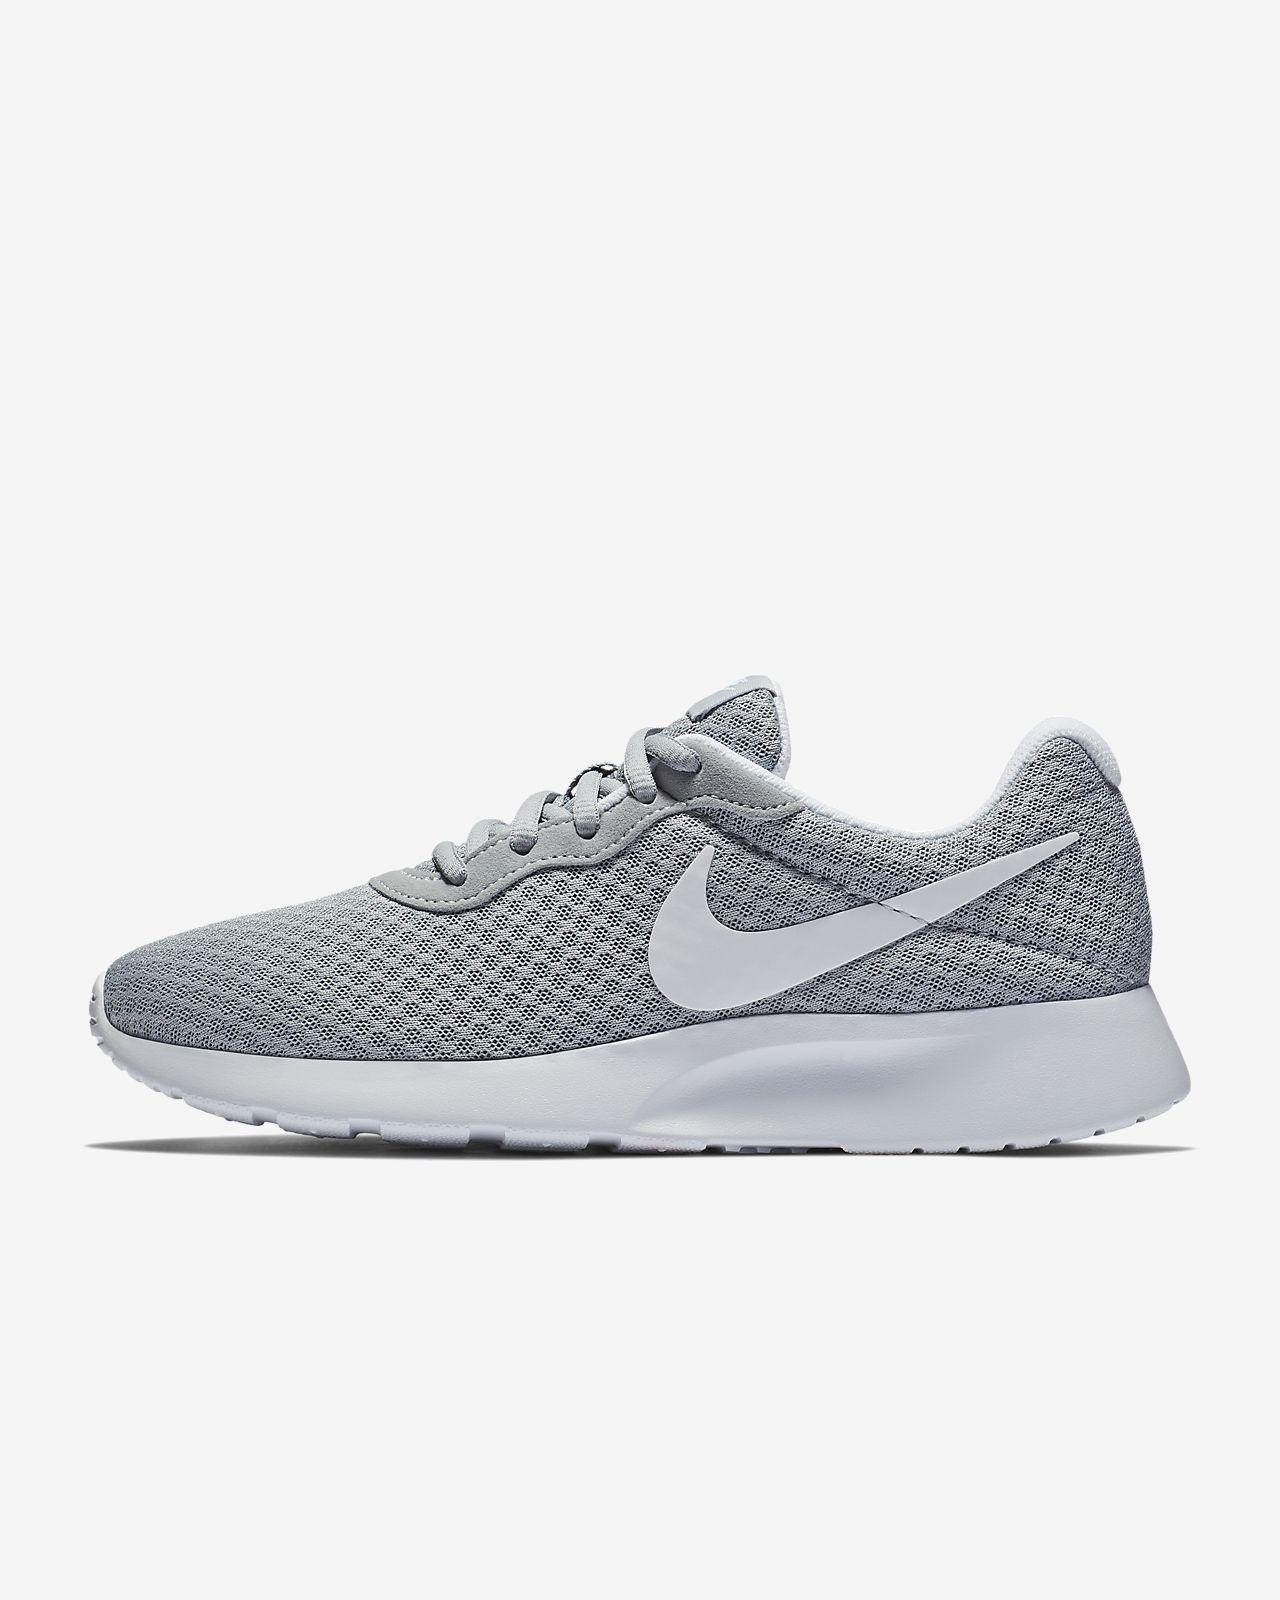 Chaussure Nike Tanjun pour Femme